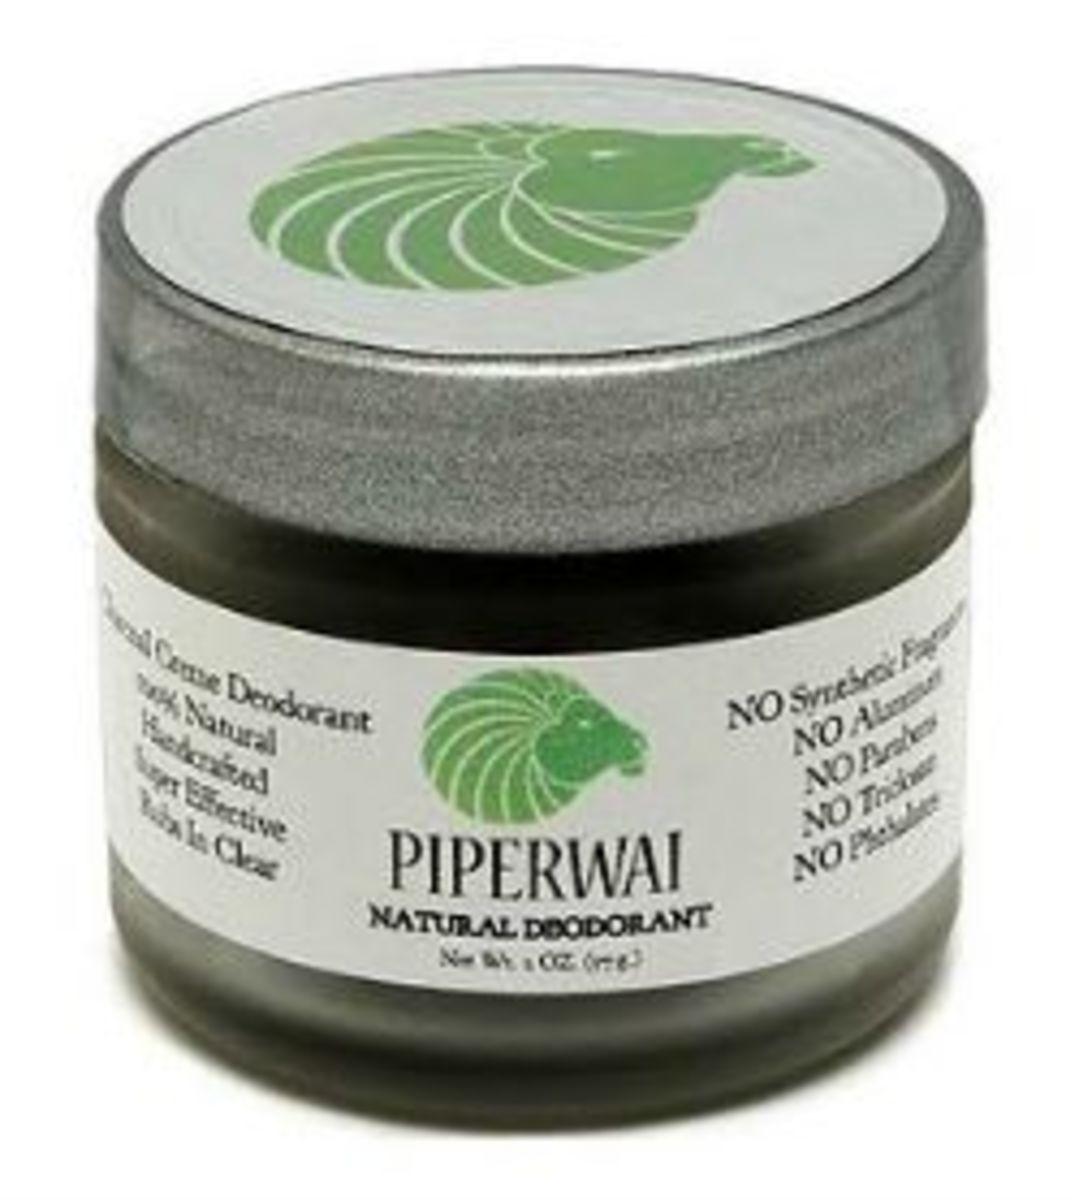 Healthy Deodorant Alternatives Piperwai Deodorant